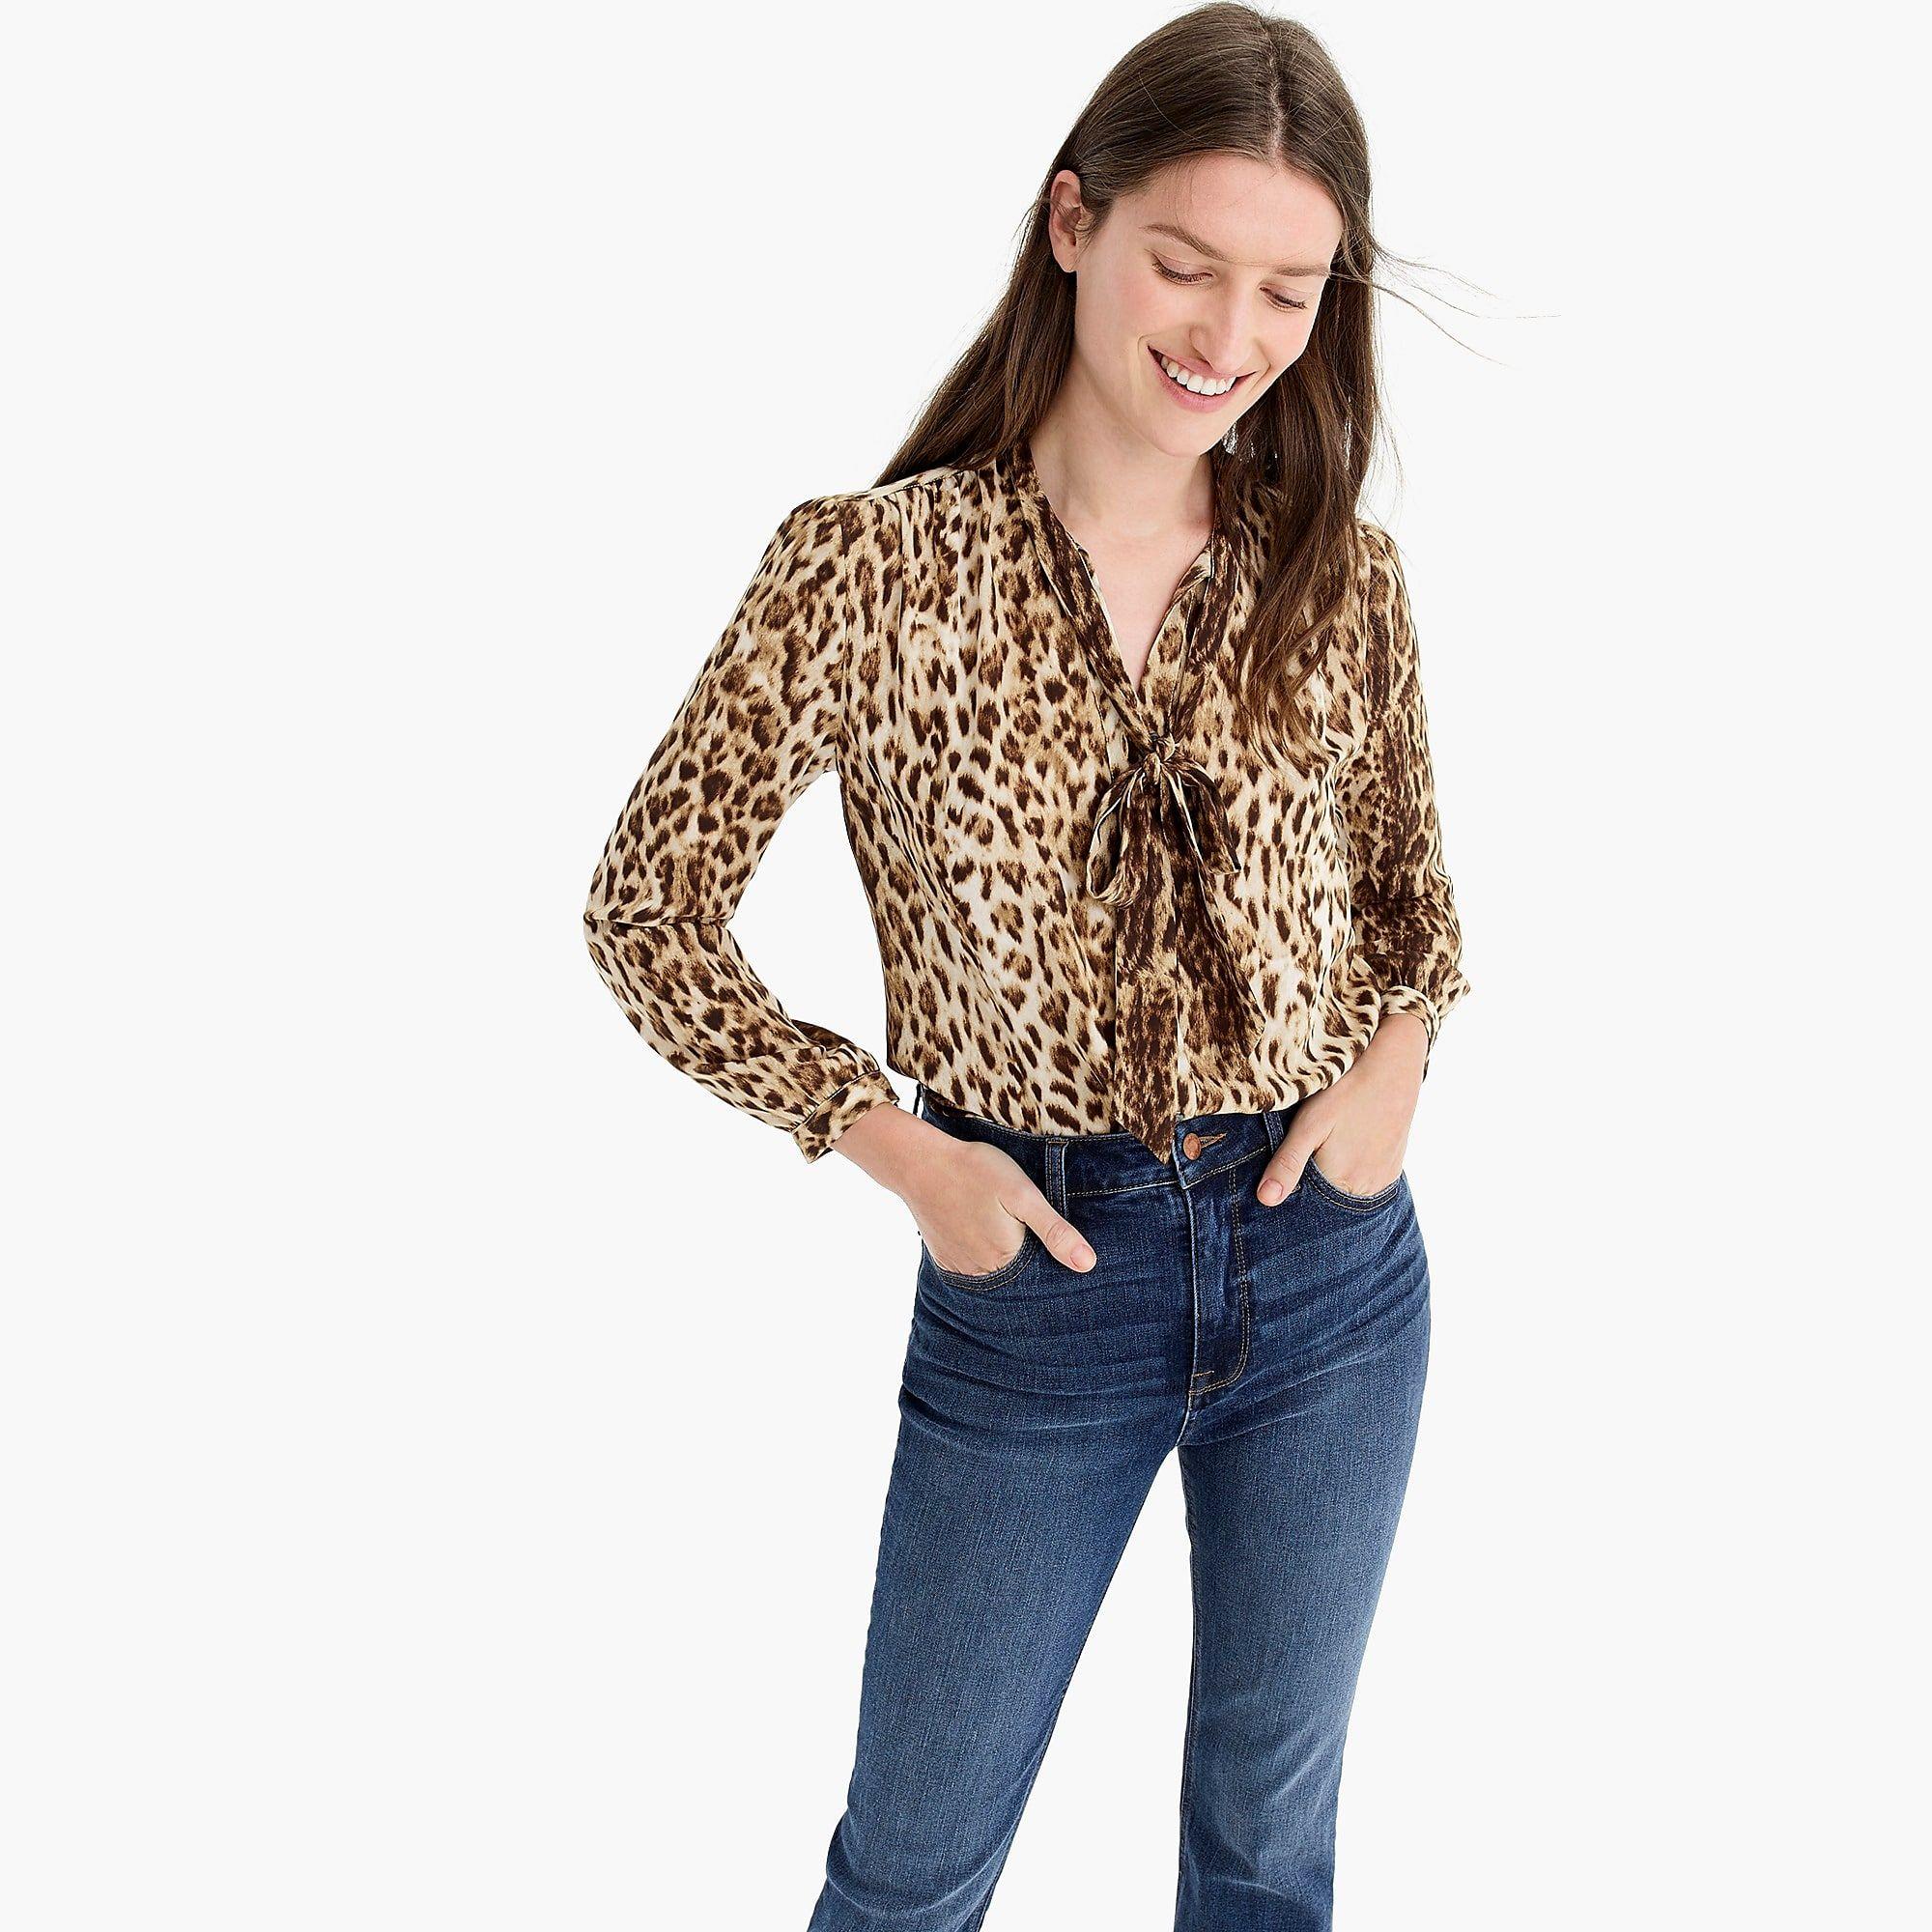 5d78fec714d Tie-neck button-up shirt in leopard print - Women's Shirts | J.Crew ...